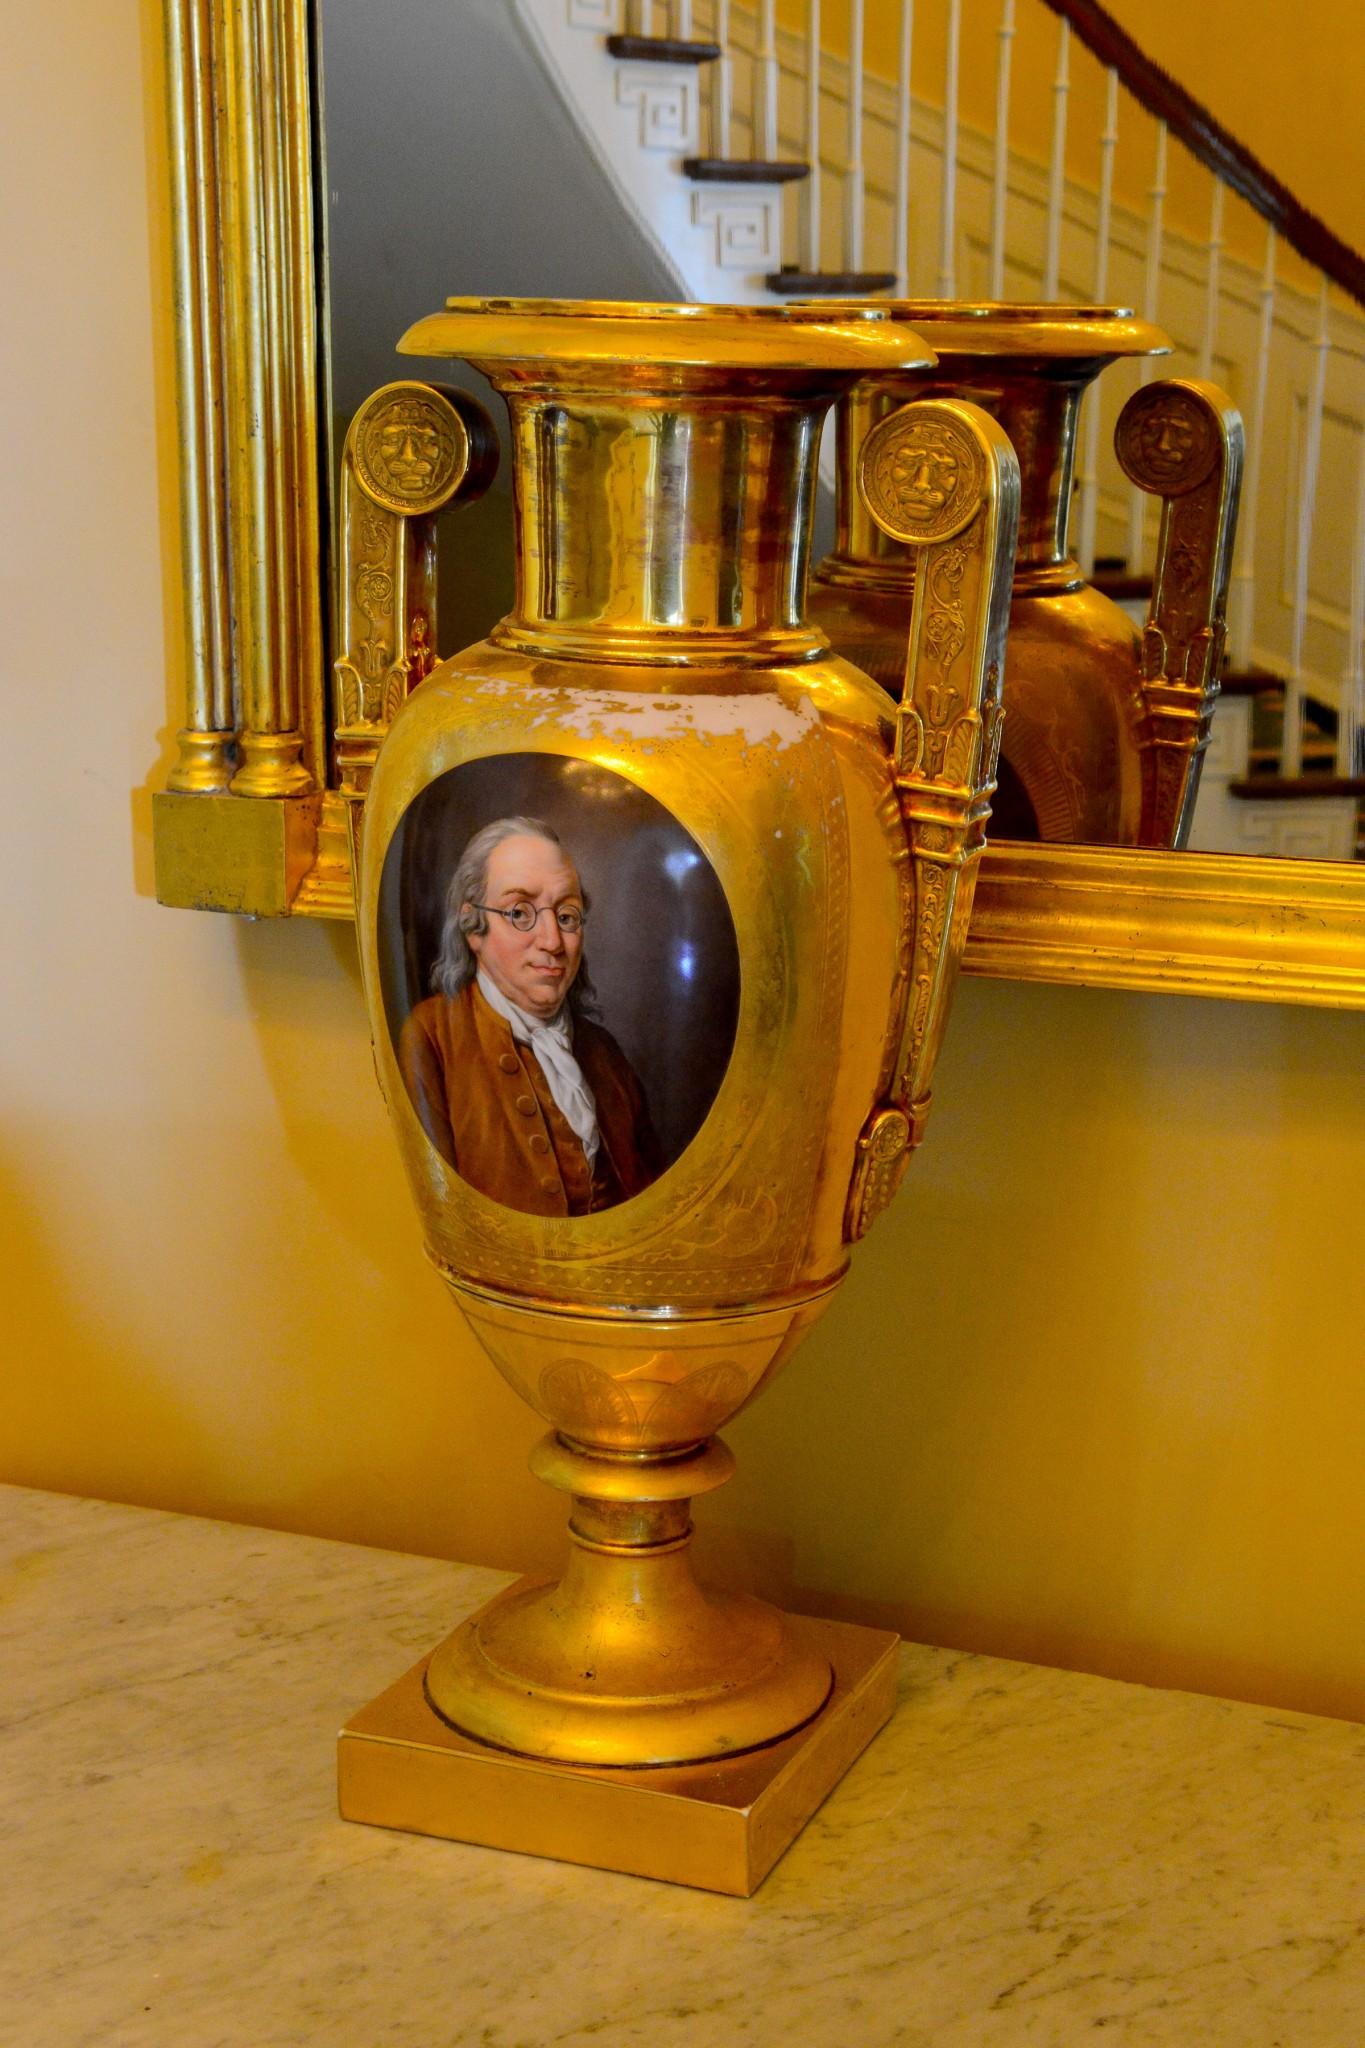 Benjamin Franklin vase. Photo by Christopher Oquendo